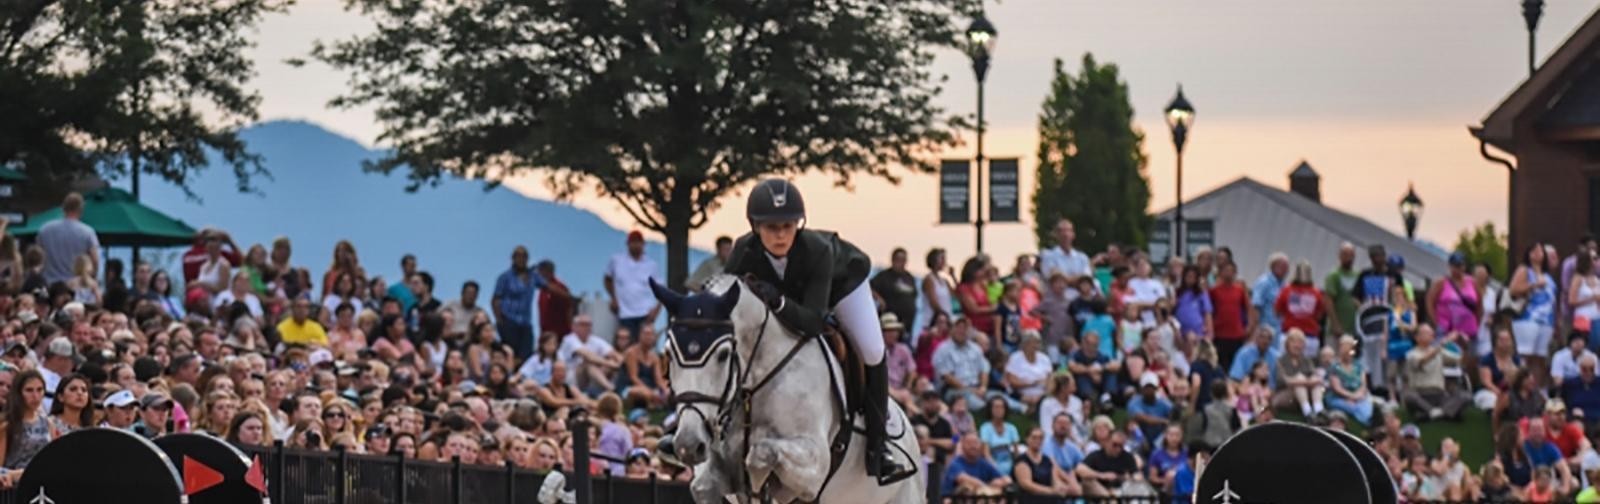 2018 FEI World Equestrian Games near Asheville, North Carolina